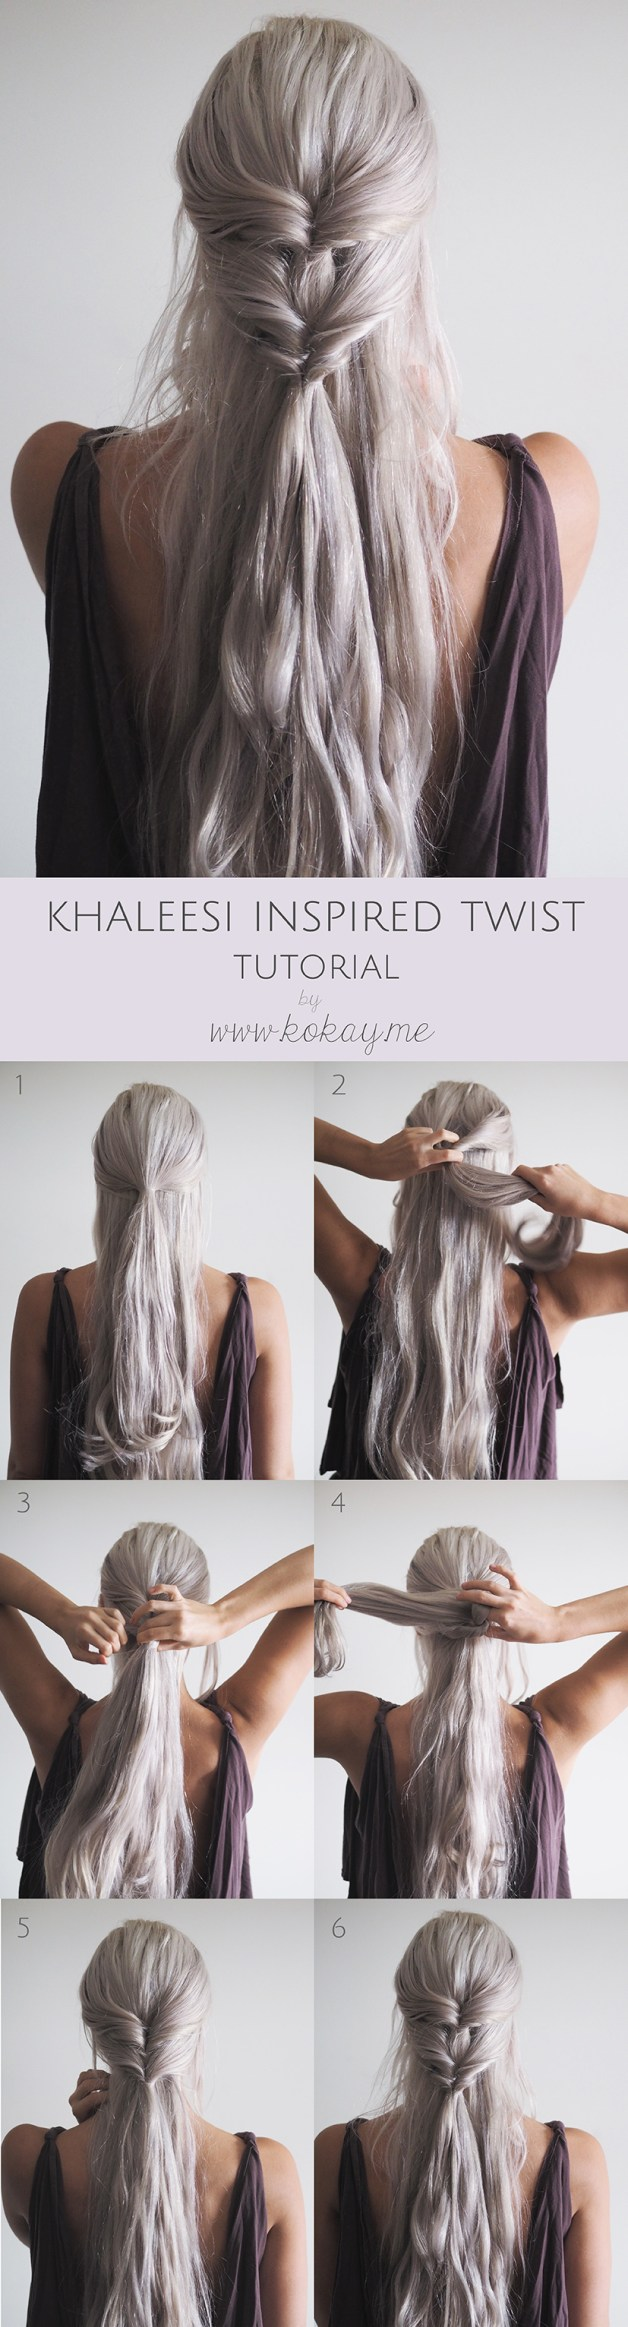 Khaleesi inspired tutorial